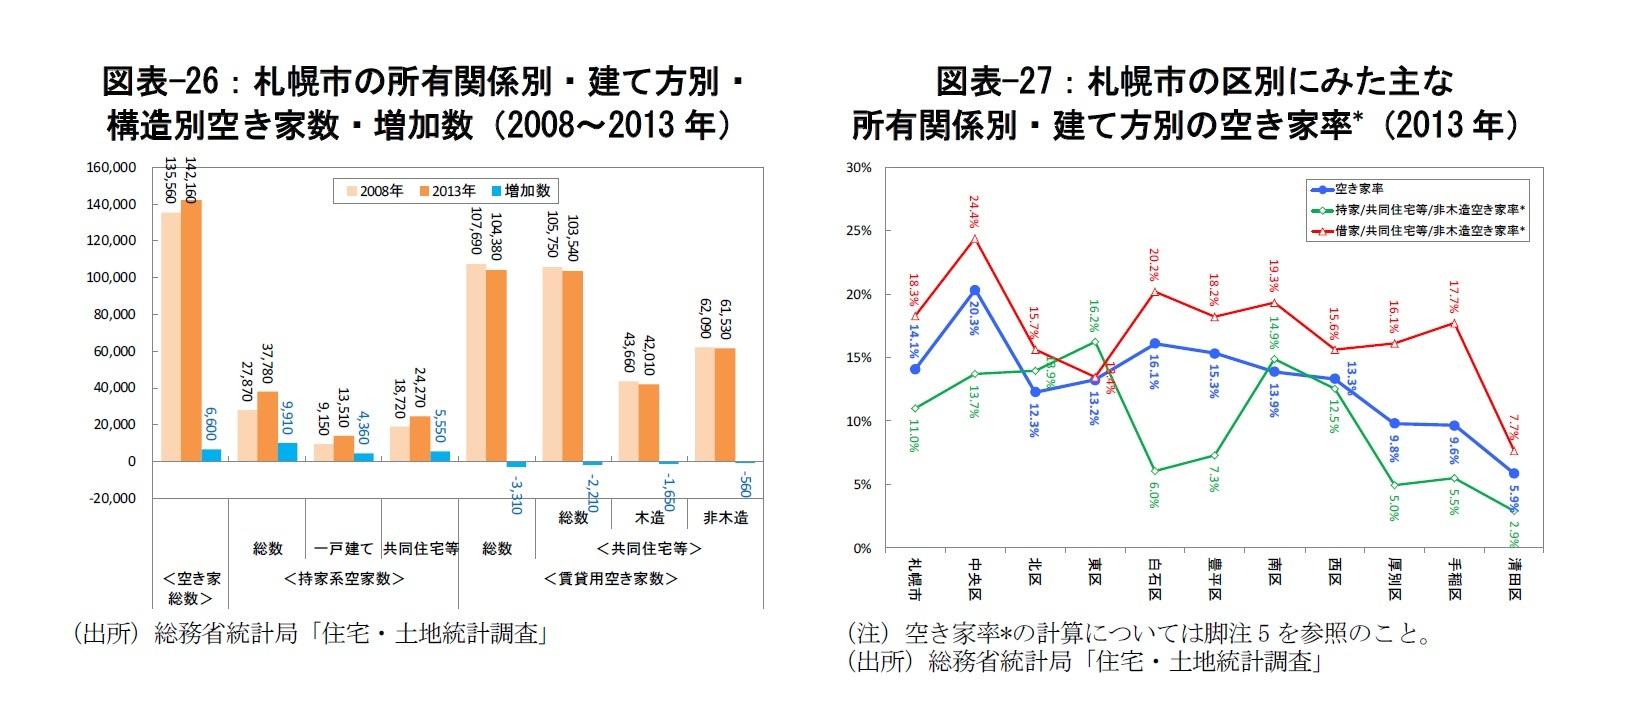 図表-26:札幌市の所有関係別・建て方別・構造別空き家数・増加数(2008~2013年)/図表-27:札幌市の区別にみた主な所有関係別・建て方別の空き家率*(2013年)